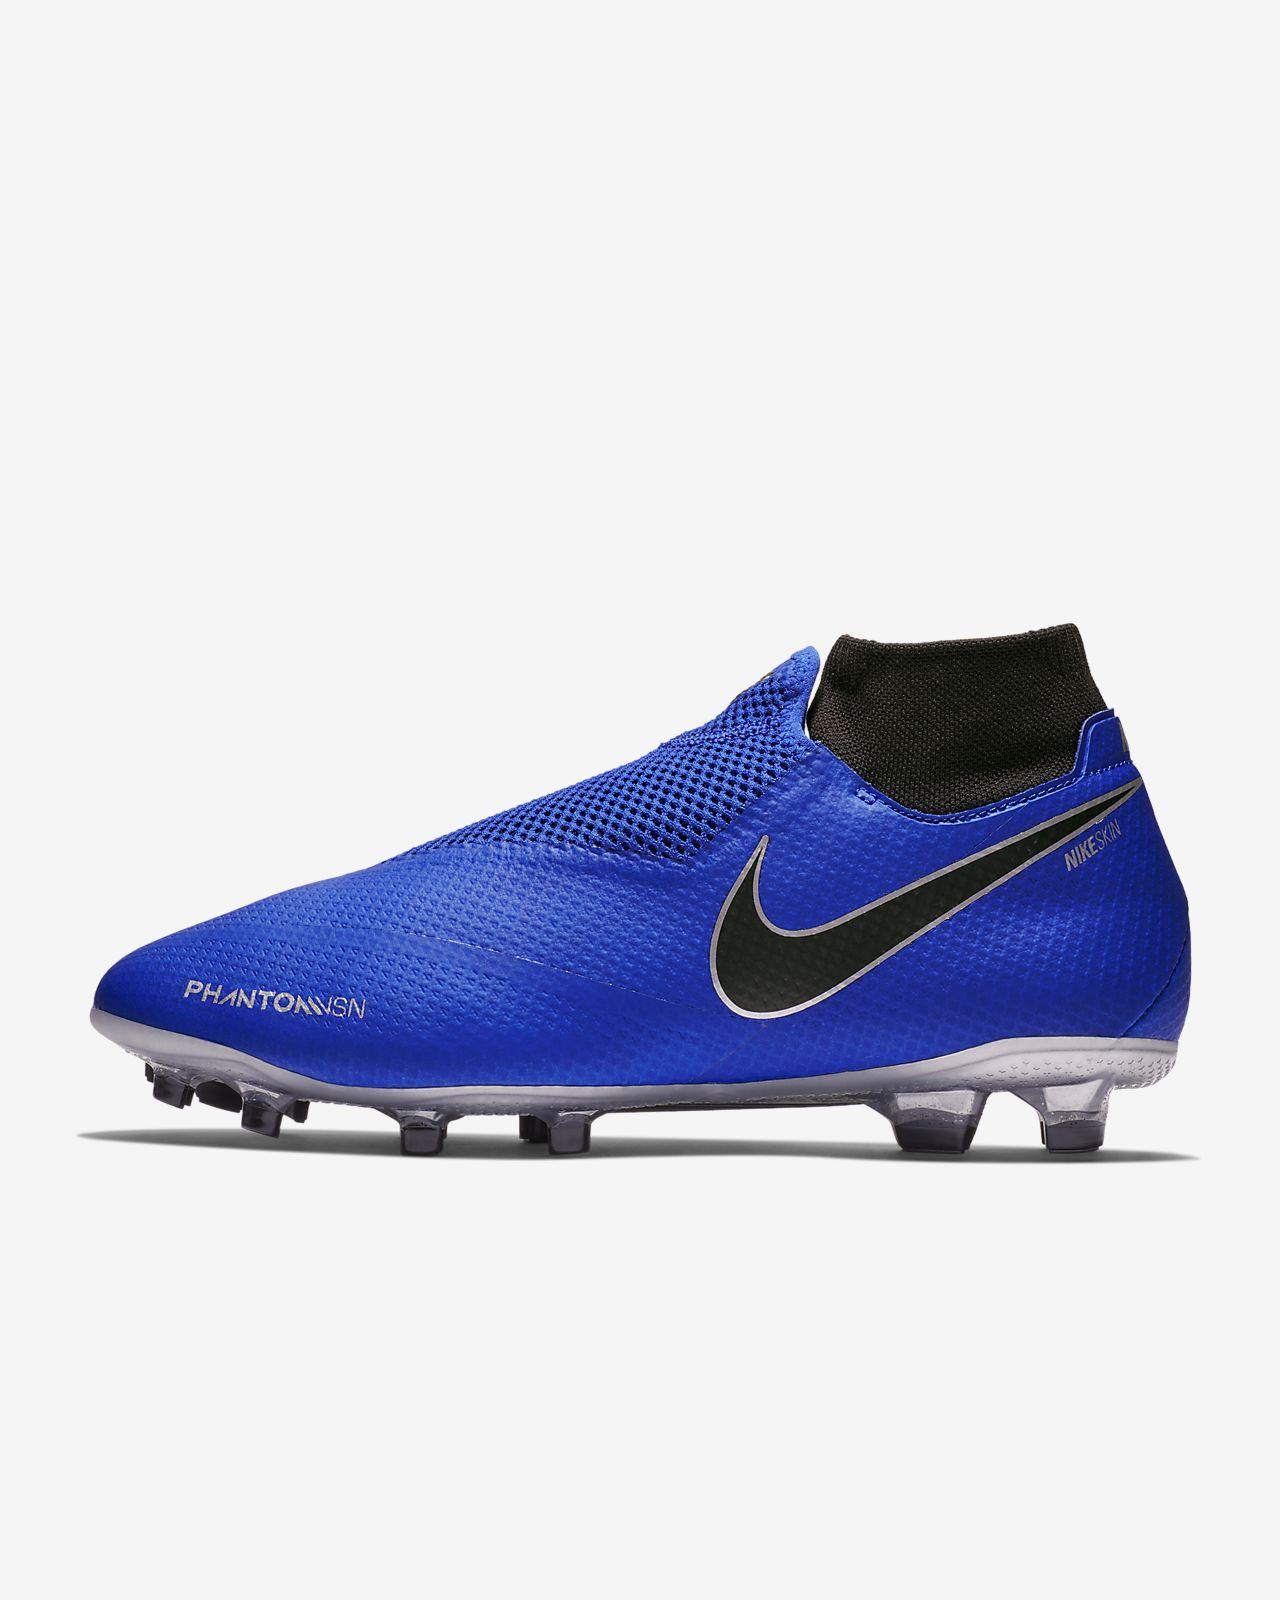 Chaussure De Phantomvsn Football Nike Terrain Crampons À Pour Sec qqxw6Aardn